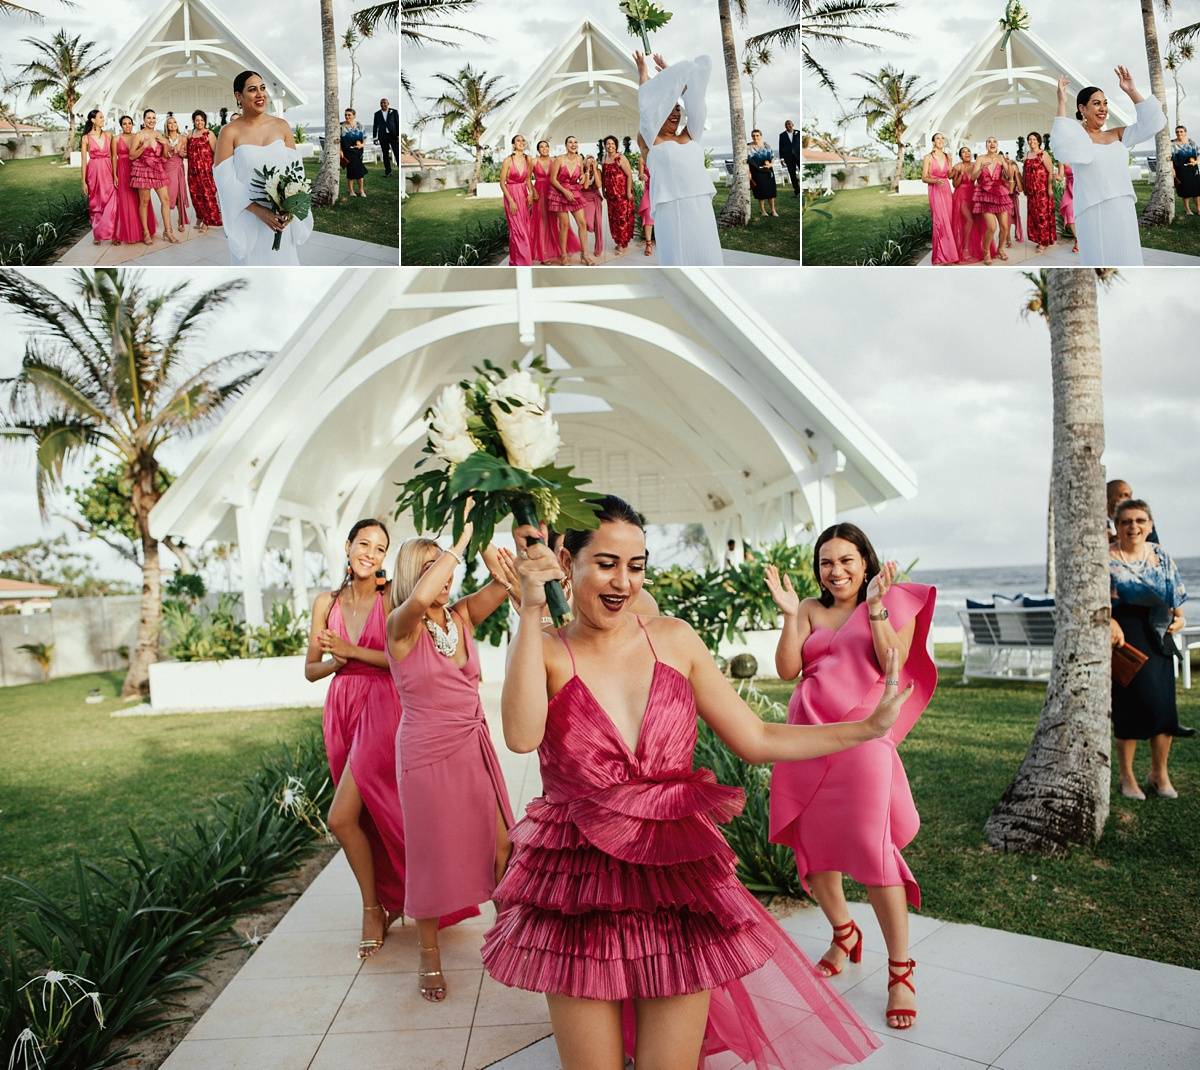 ryck-nyra-wedding-tamanu-on-the-beach-vanuatu-groovy-banana_0035.jpg